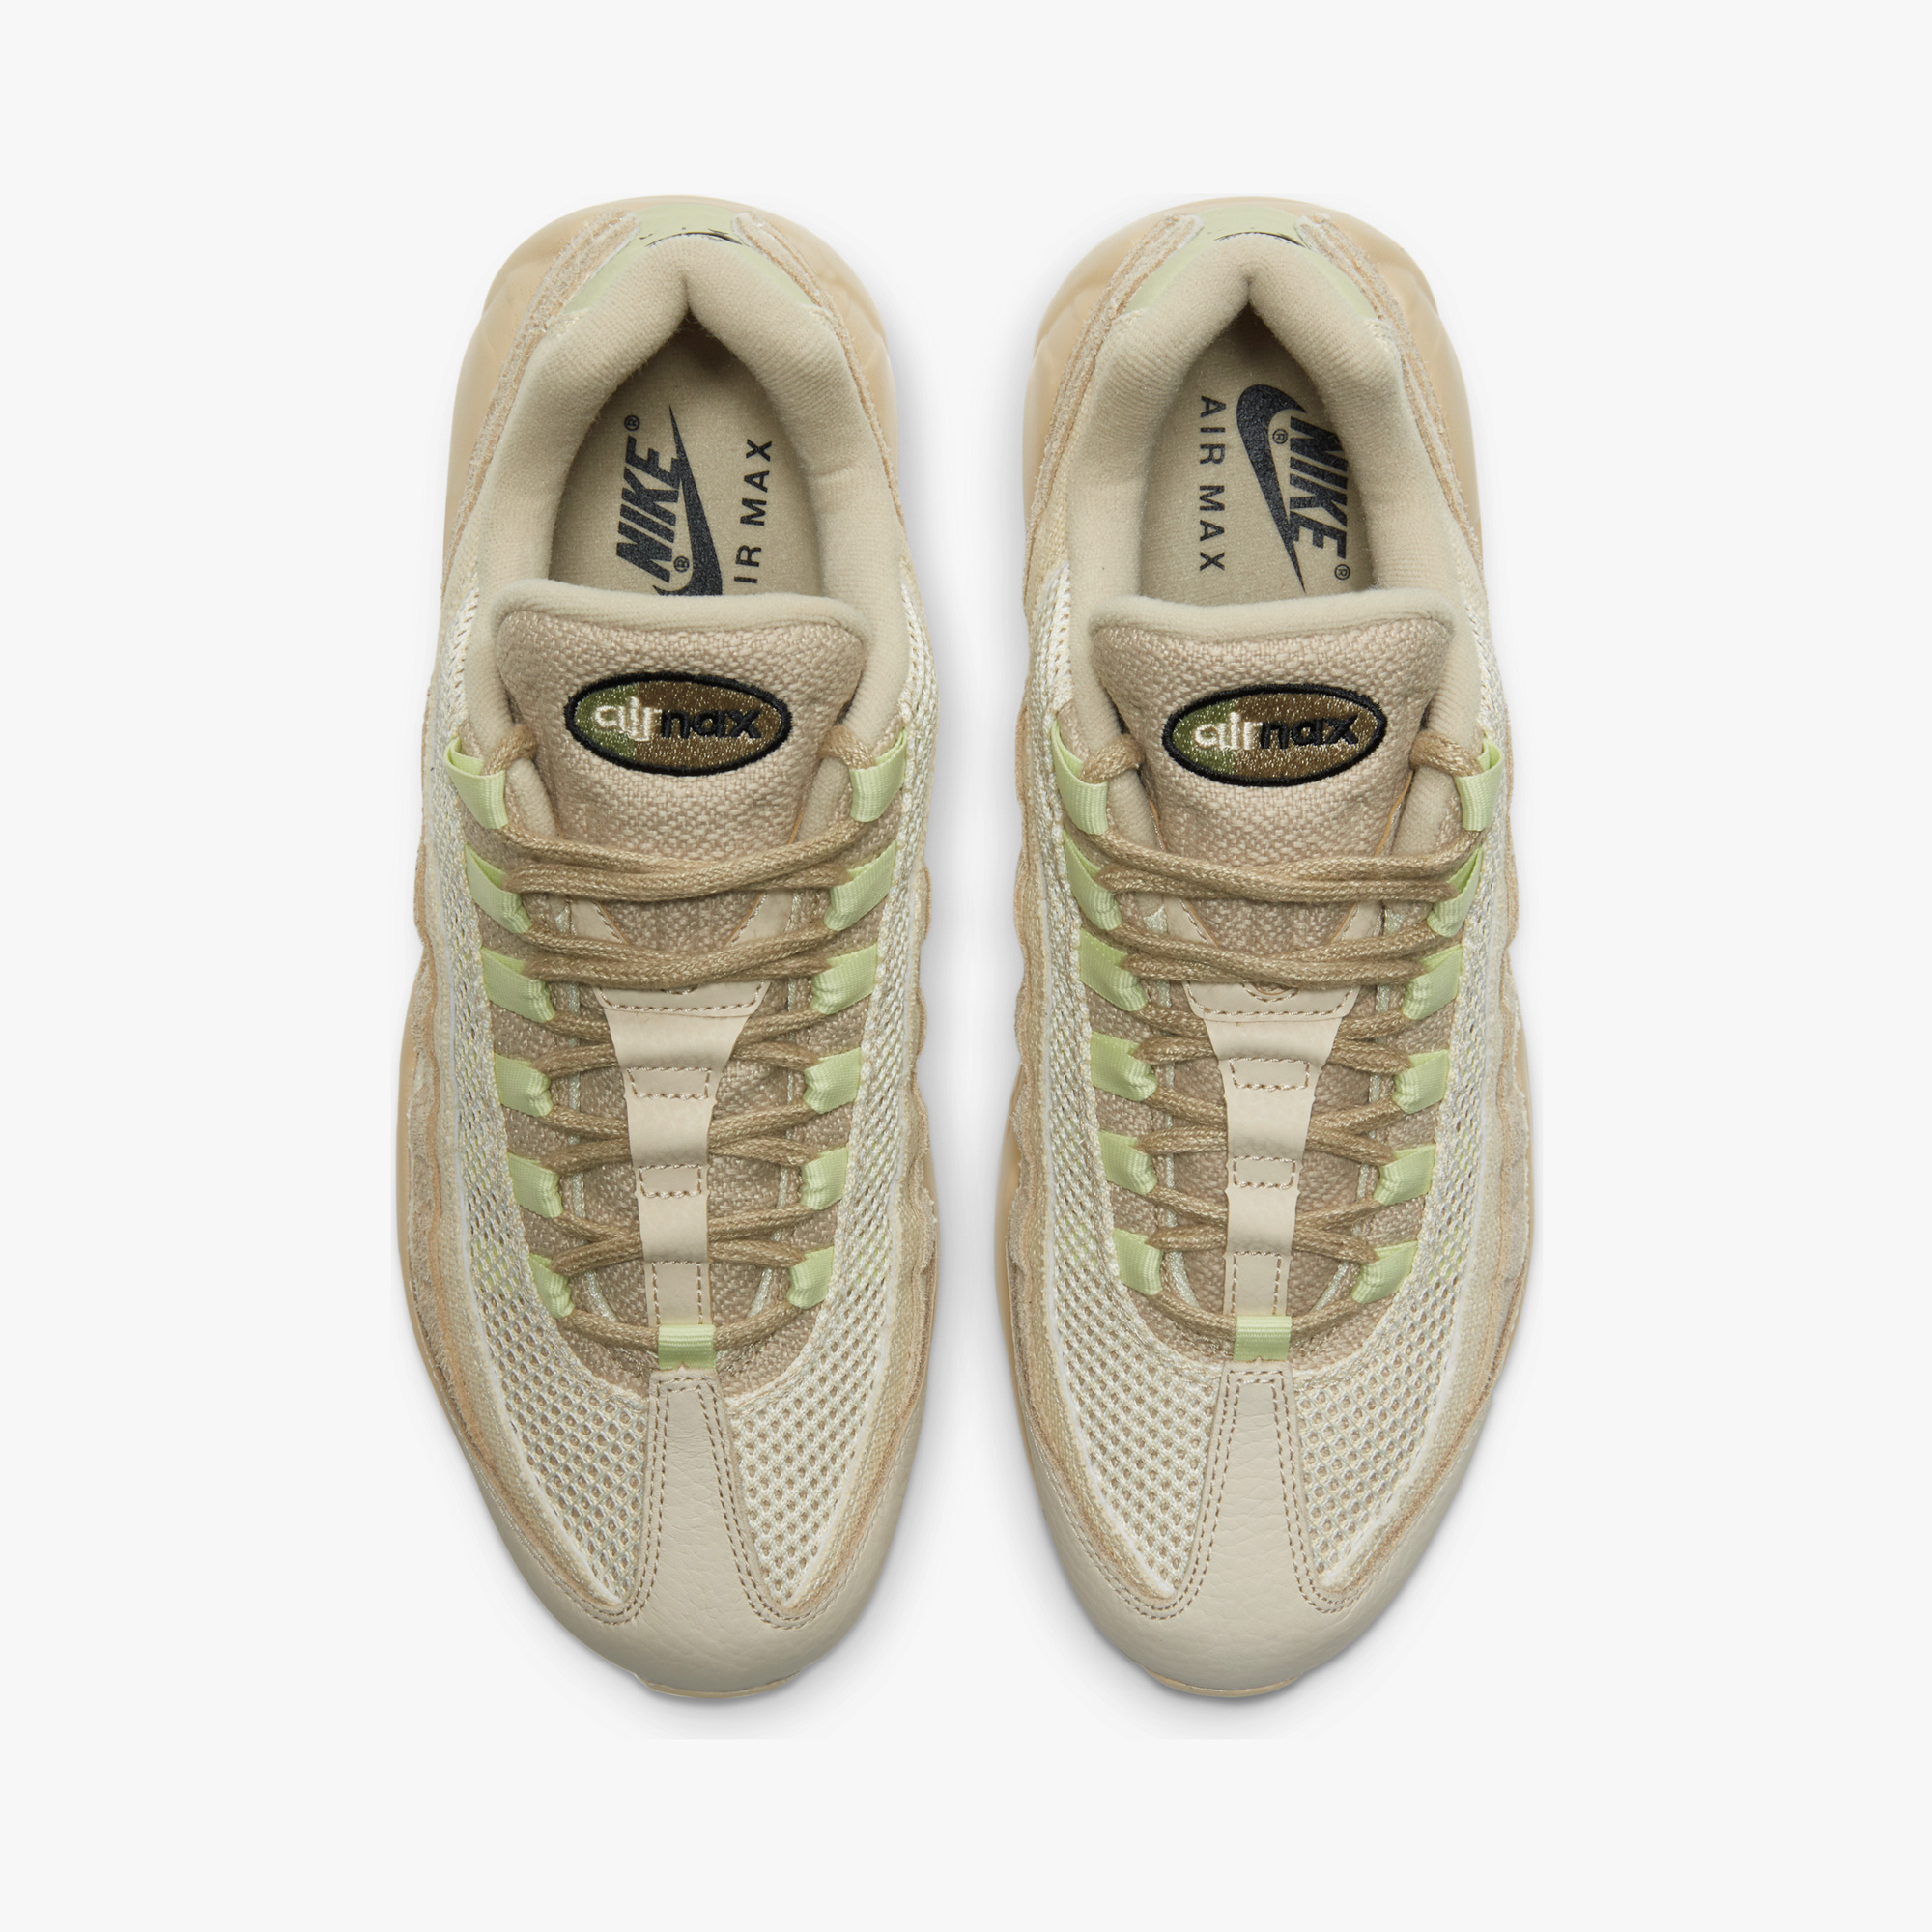 Nike Air Max 95 Prm Cl - Dh4102-200 - SNS   sneakers & streetwear ...